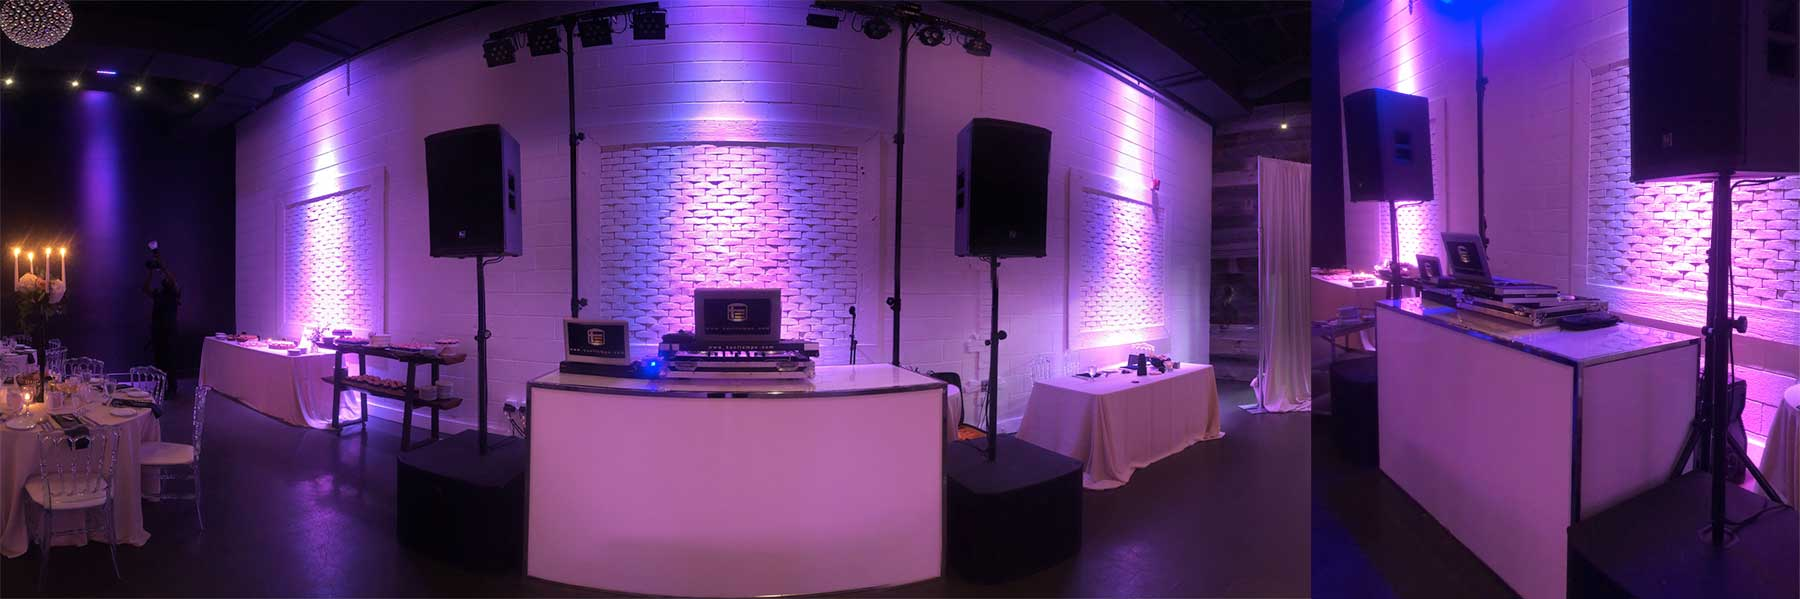 YMG - York Mills Gallery - Toronto Wedding DJ